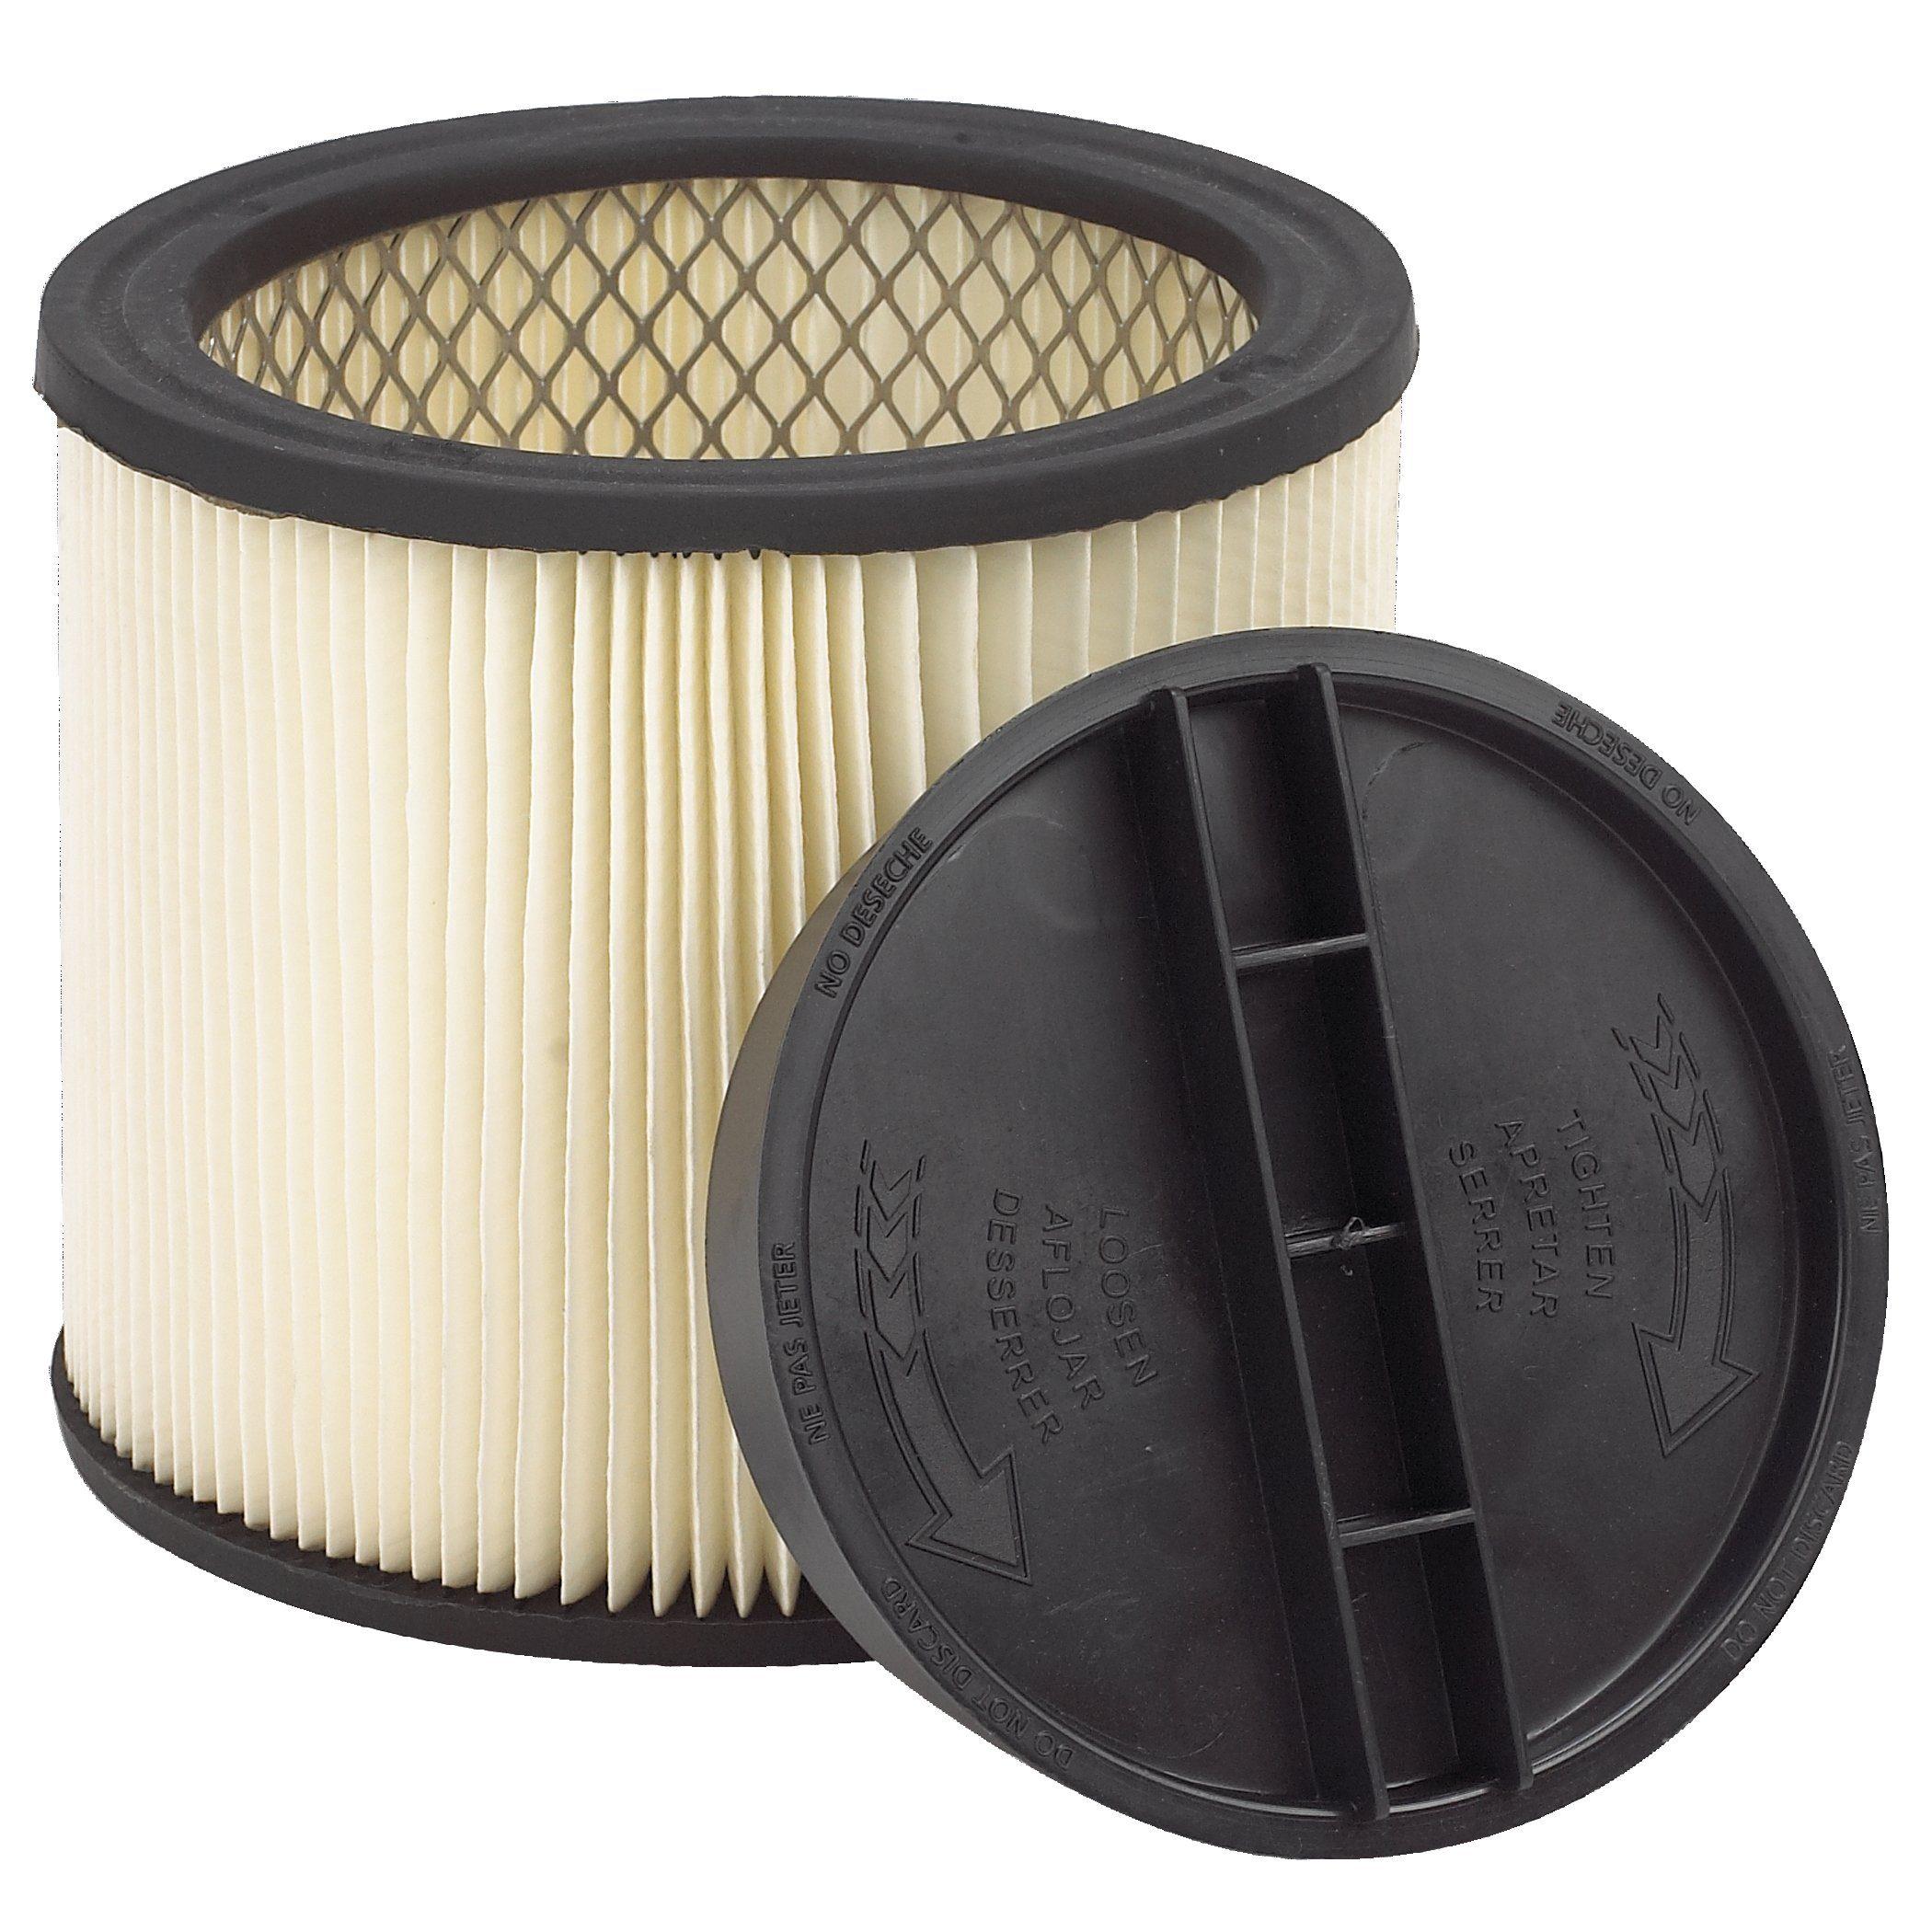 ShopVac Filter für ShopVac Geräte (außer Wall Mount, Ash Vac, Micro) »Faltenfilter Standard«